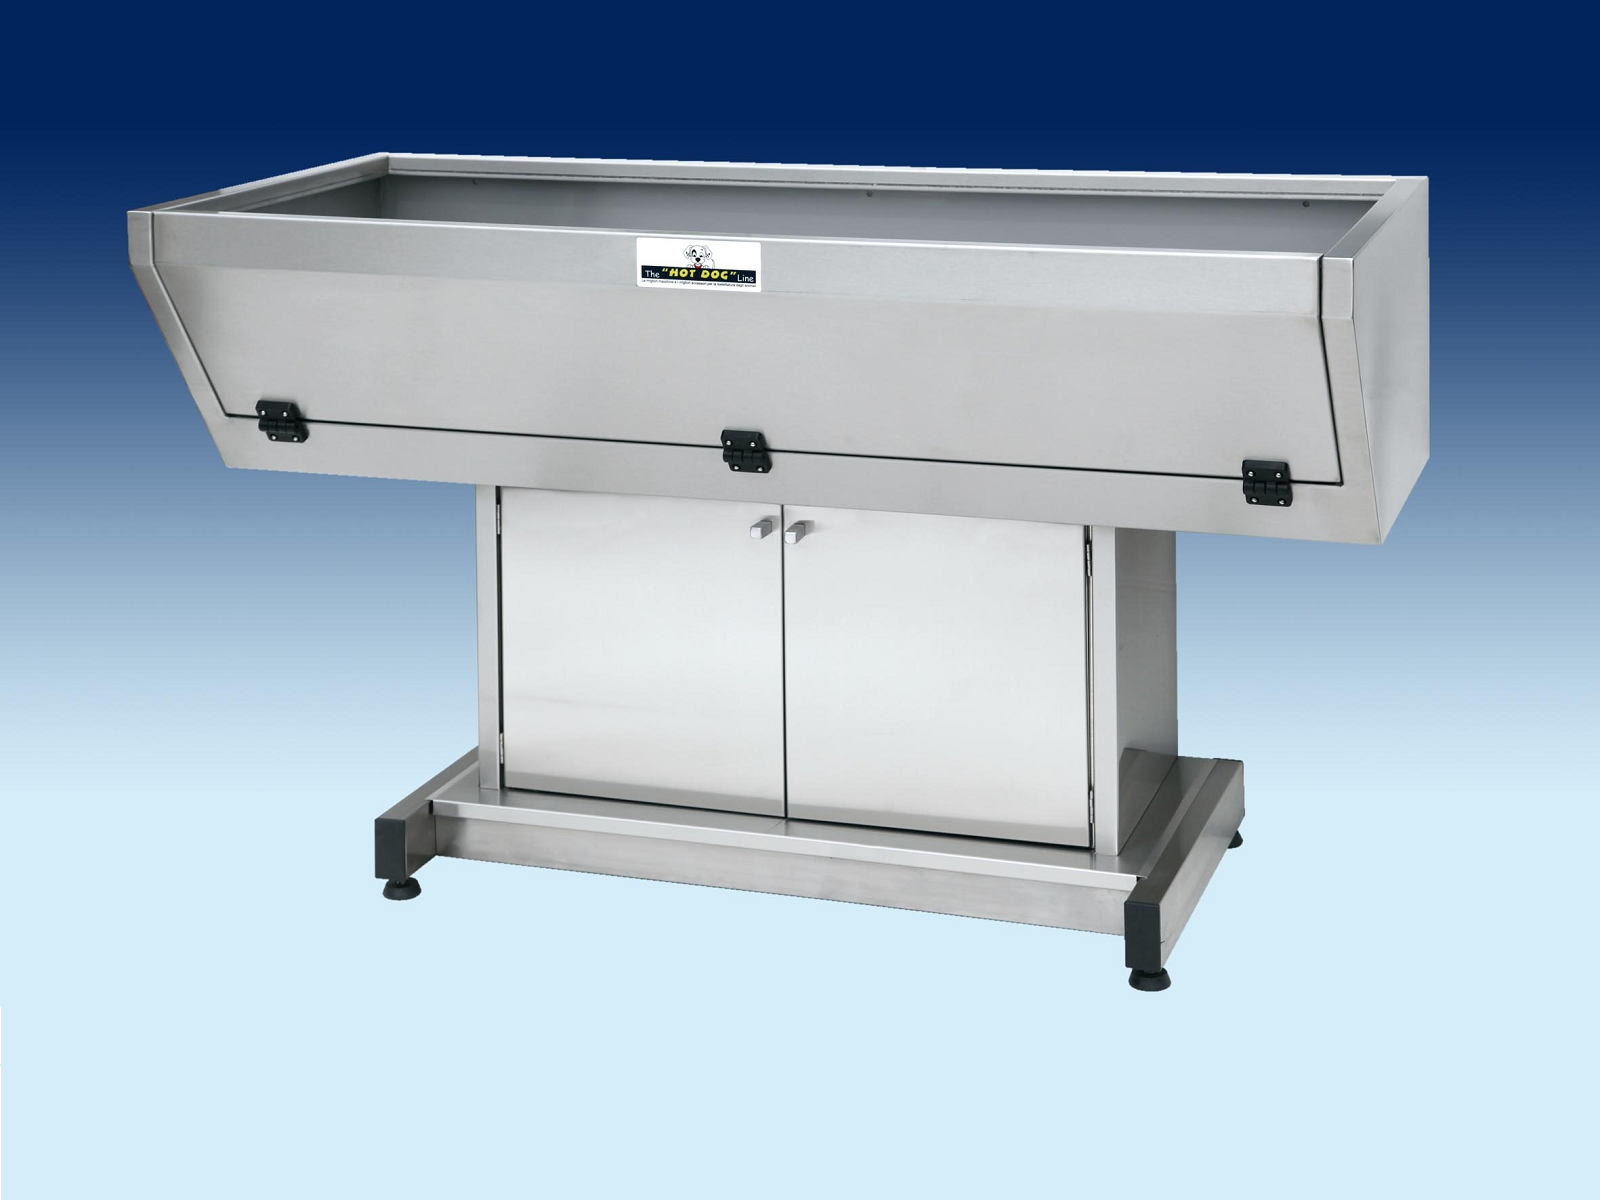 Vasca Da Toelettatura : Vasche lavaggio : vasca hd 7000 inox